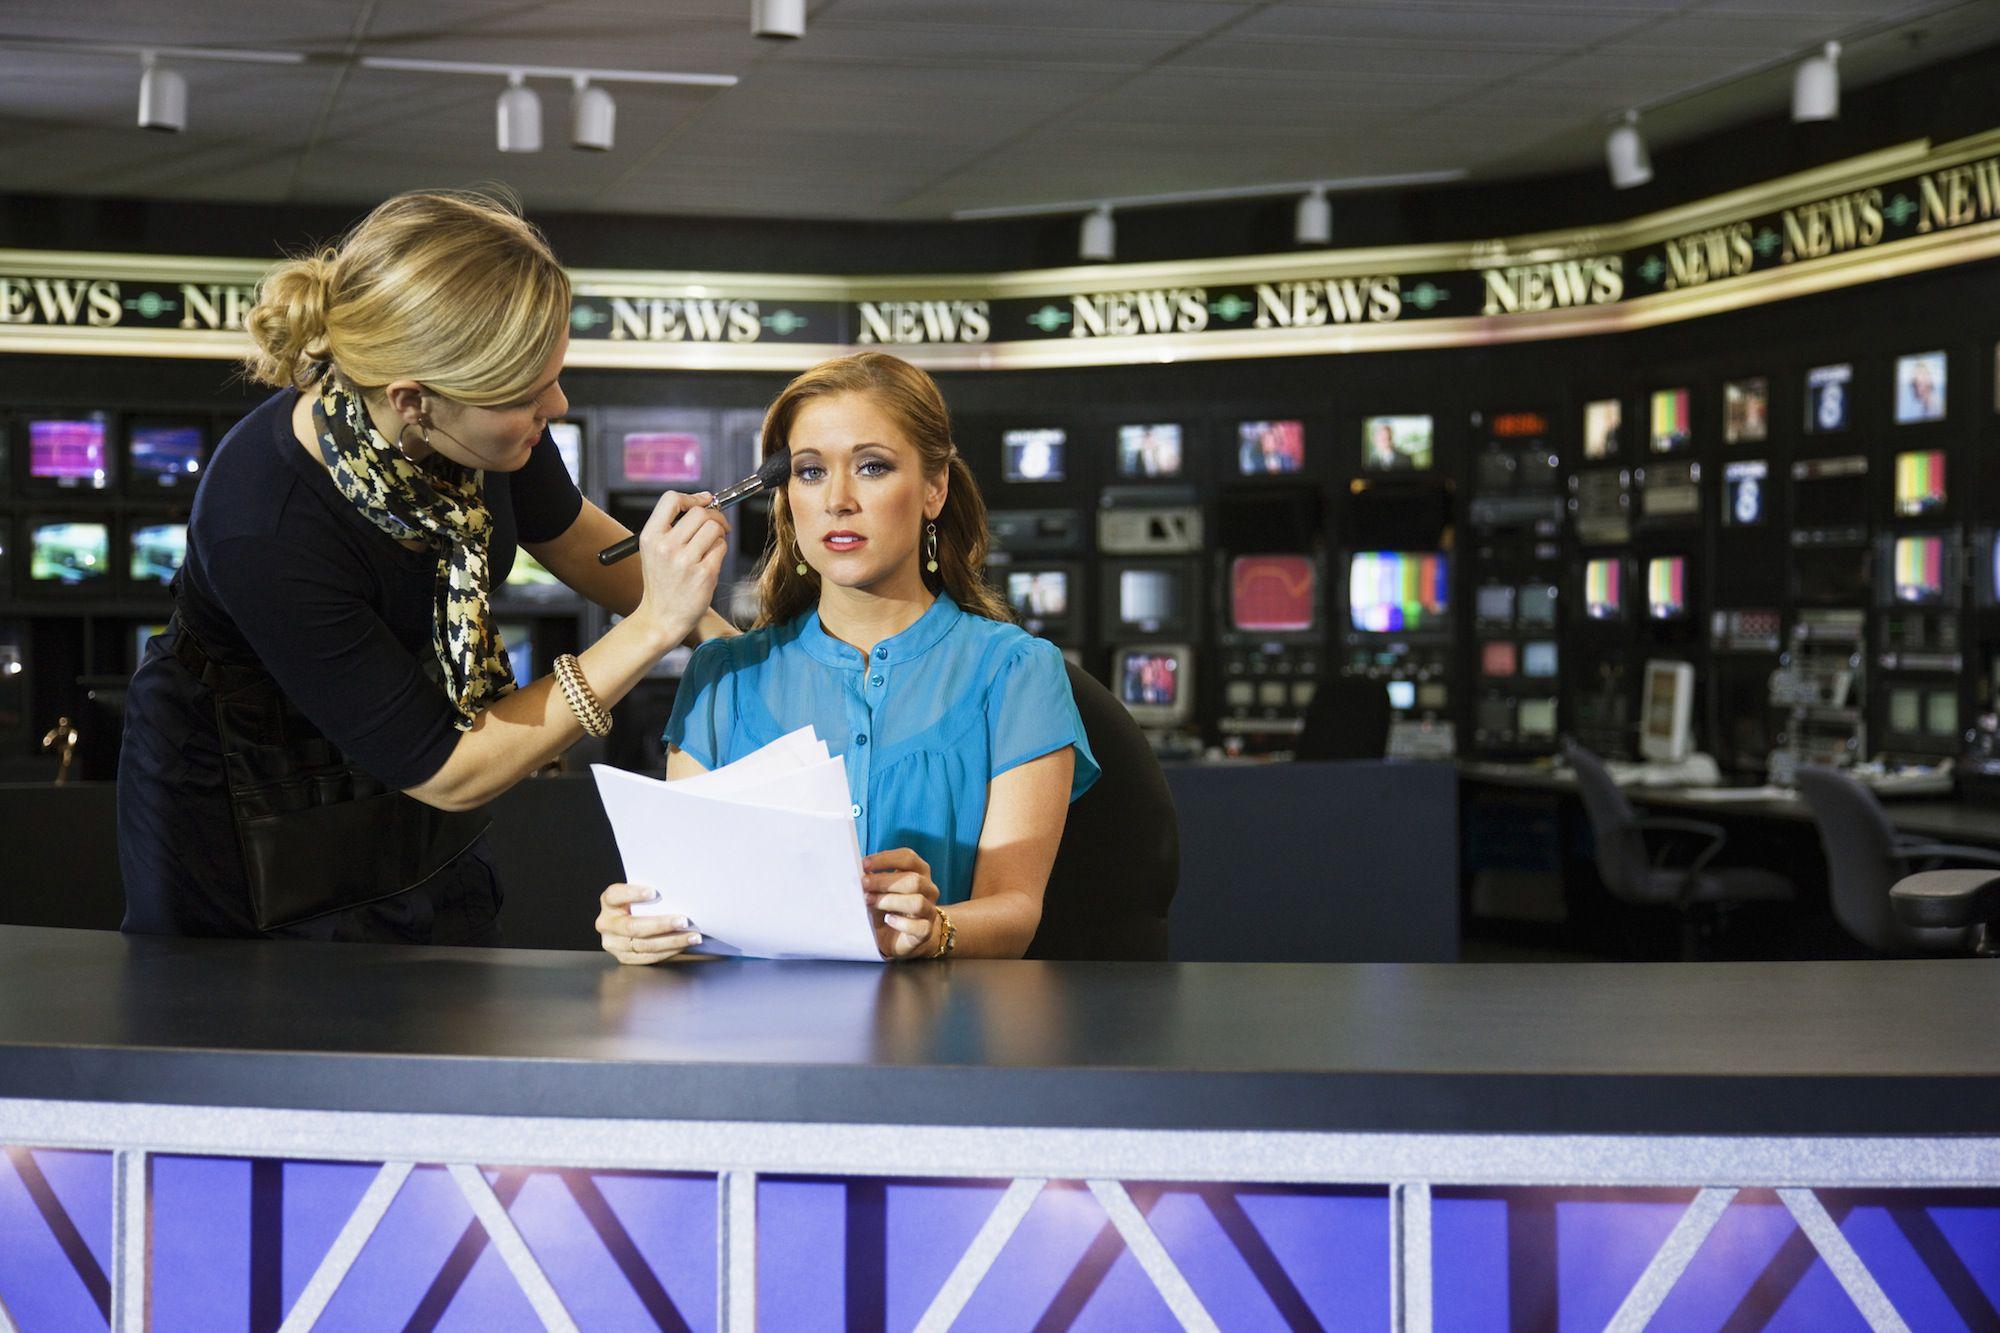 tv news anchor career profile and job description